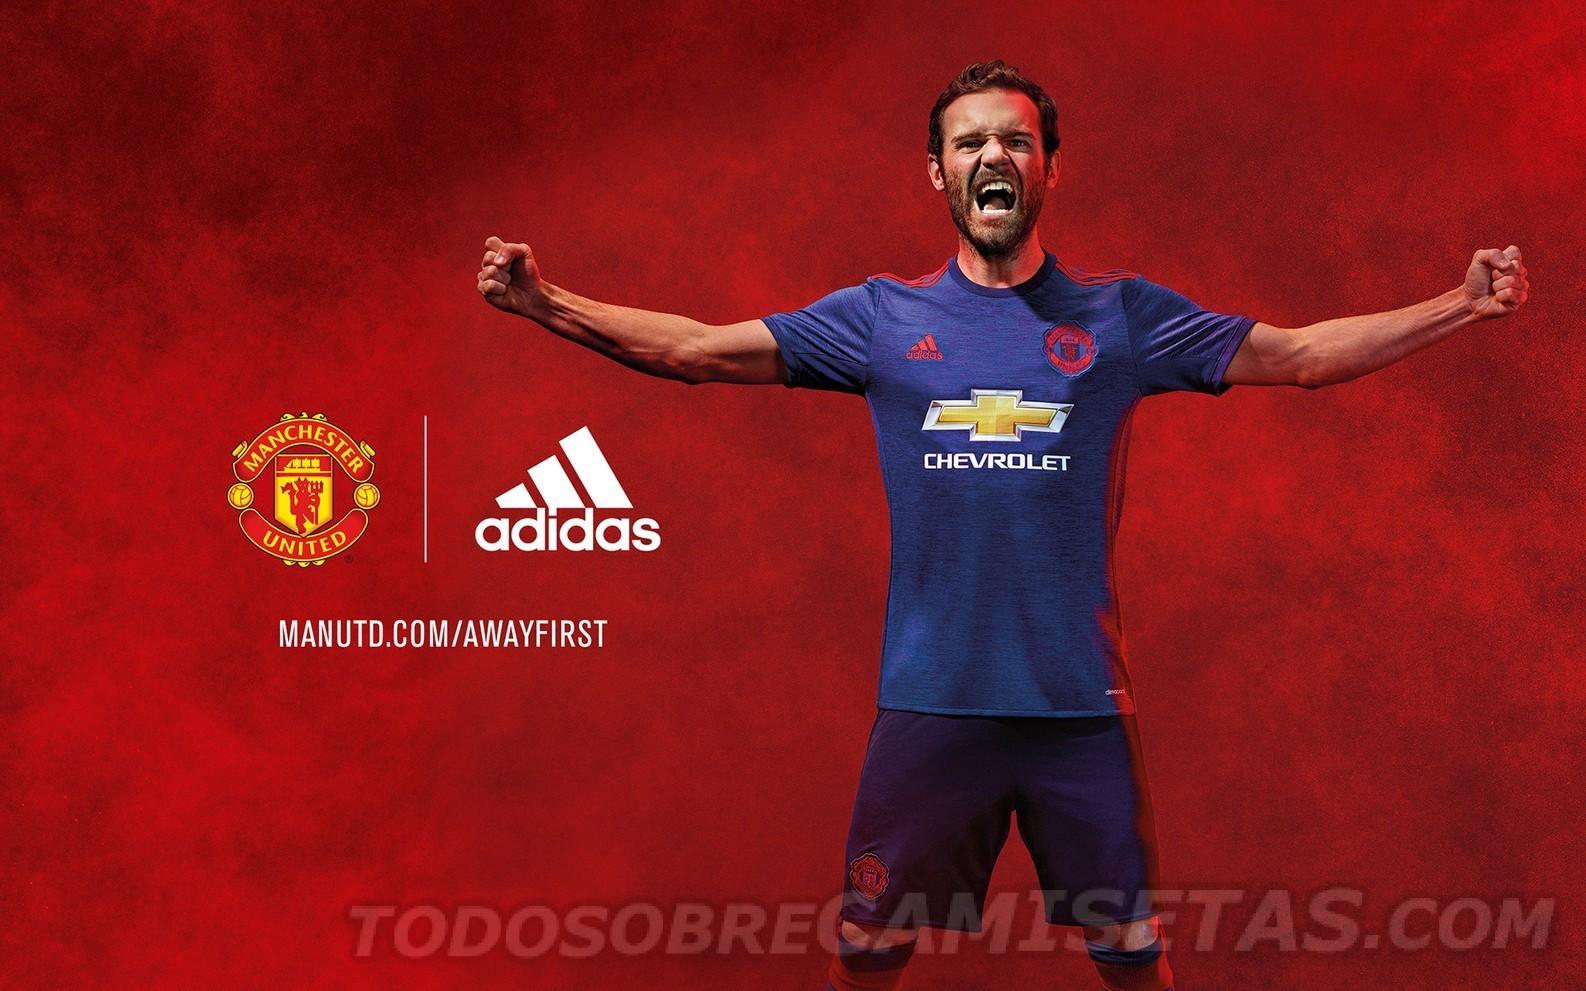 Manchester-United-2016-17-adidas-new-away-kit-10.jpg